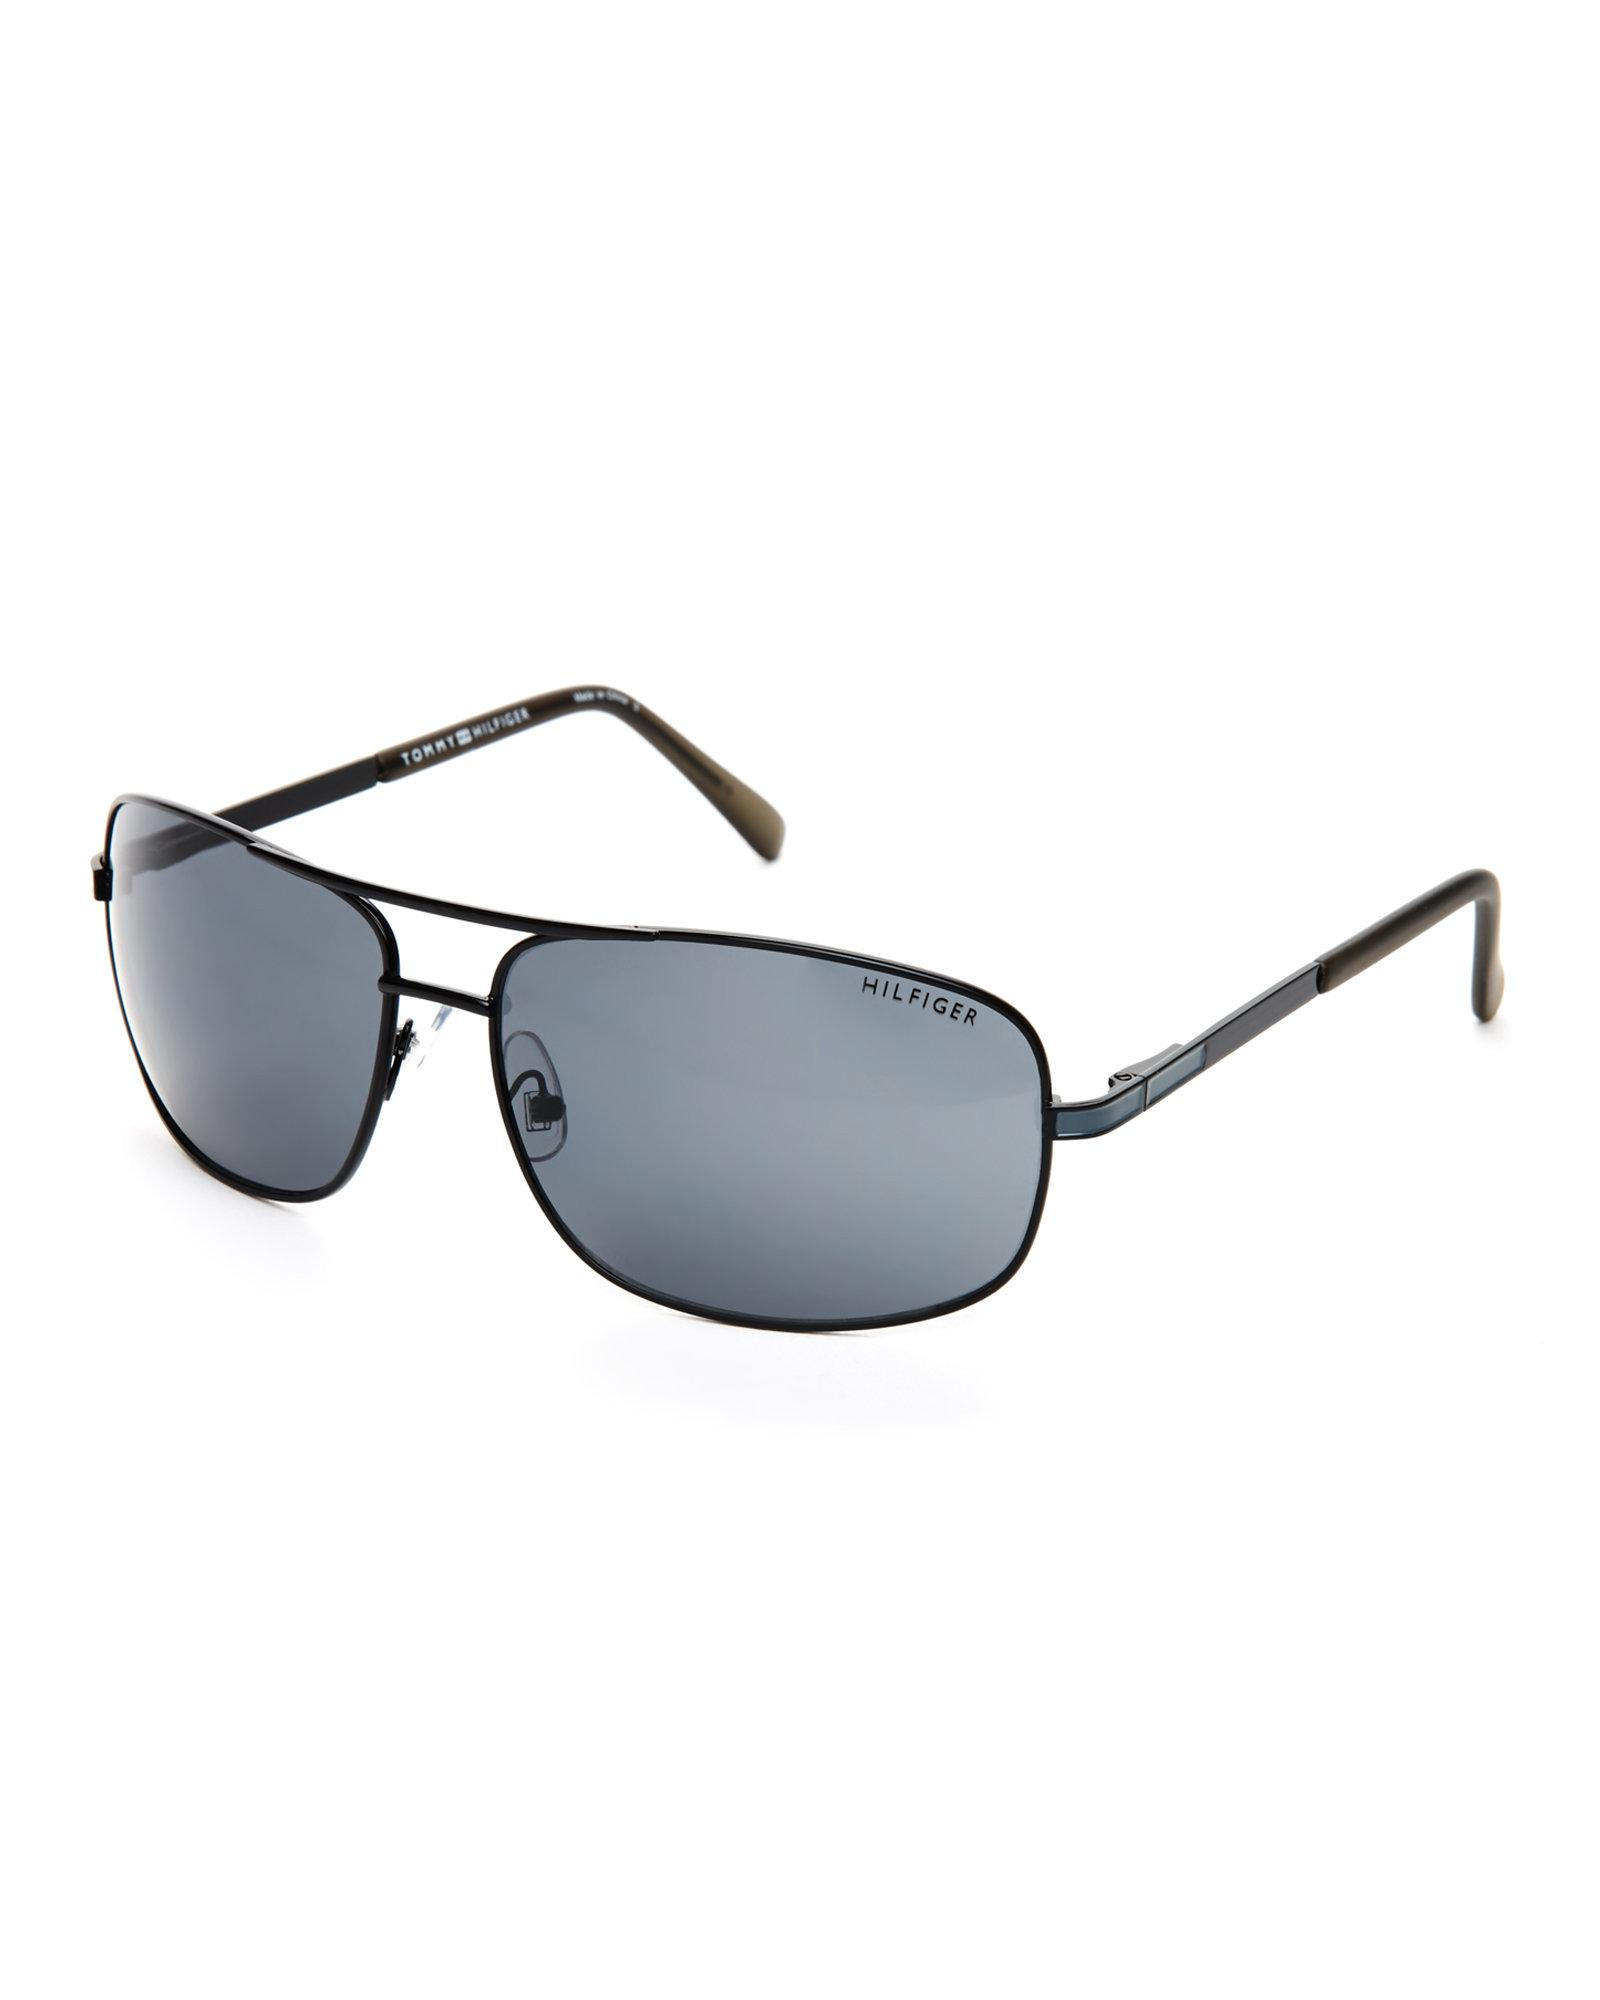 Navigator Tommy In Phillip Lyst Sunglasses Hilfiger Black wpnqdxSIT